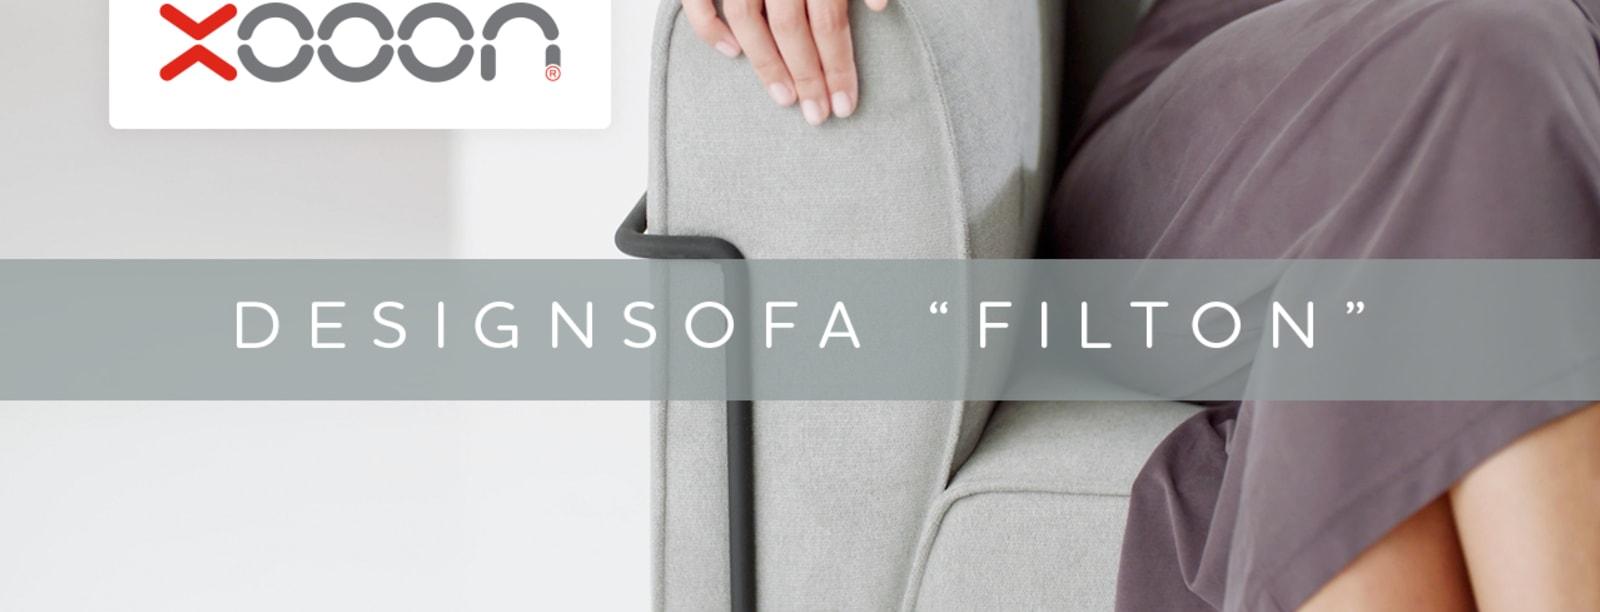 1 sofa, 2 styles